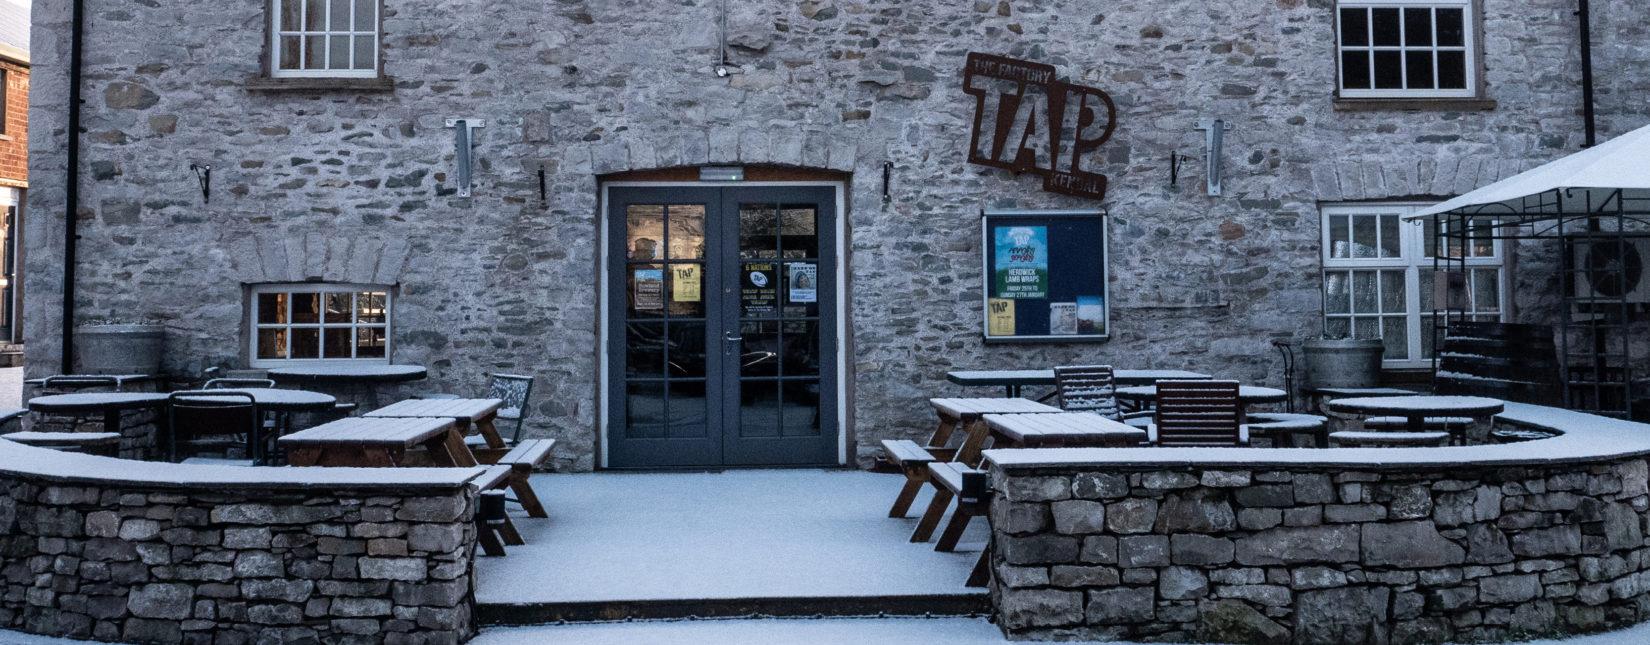 Tap Pub Banner